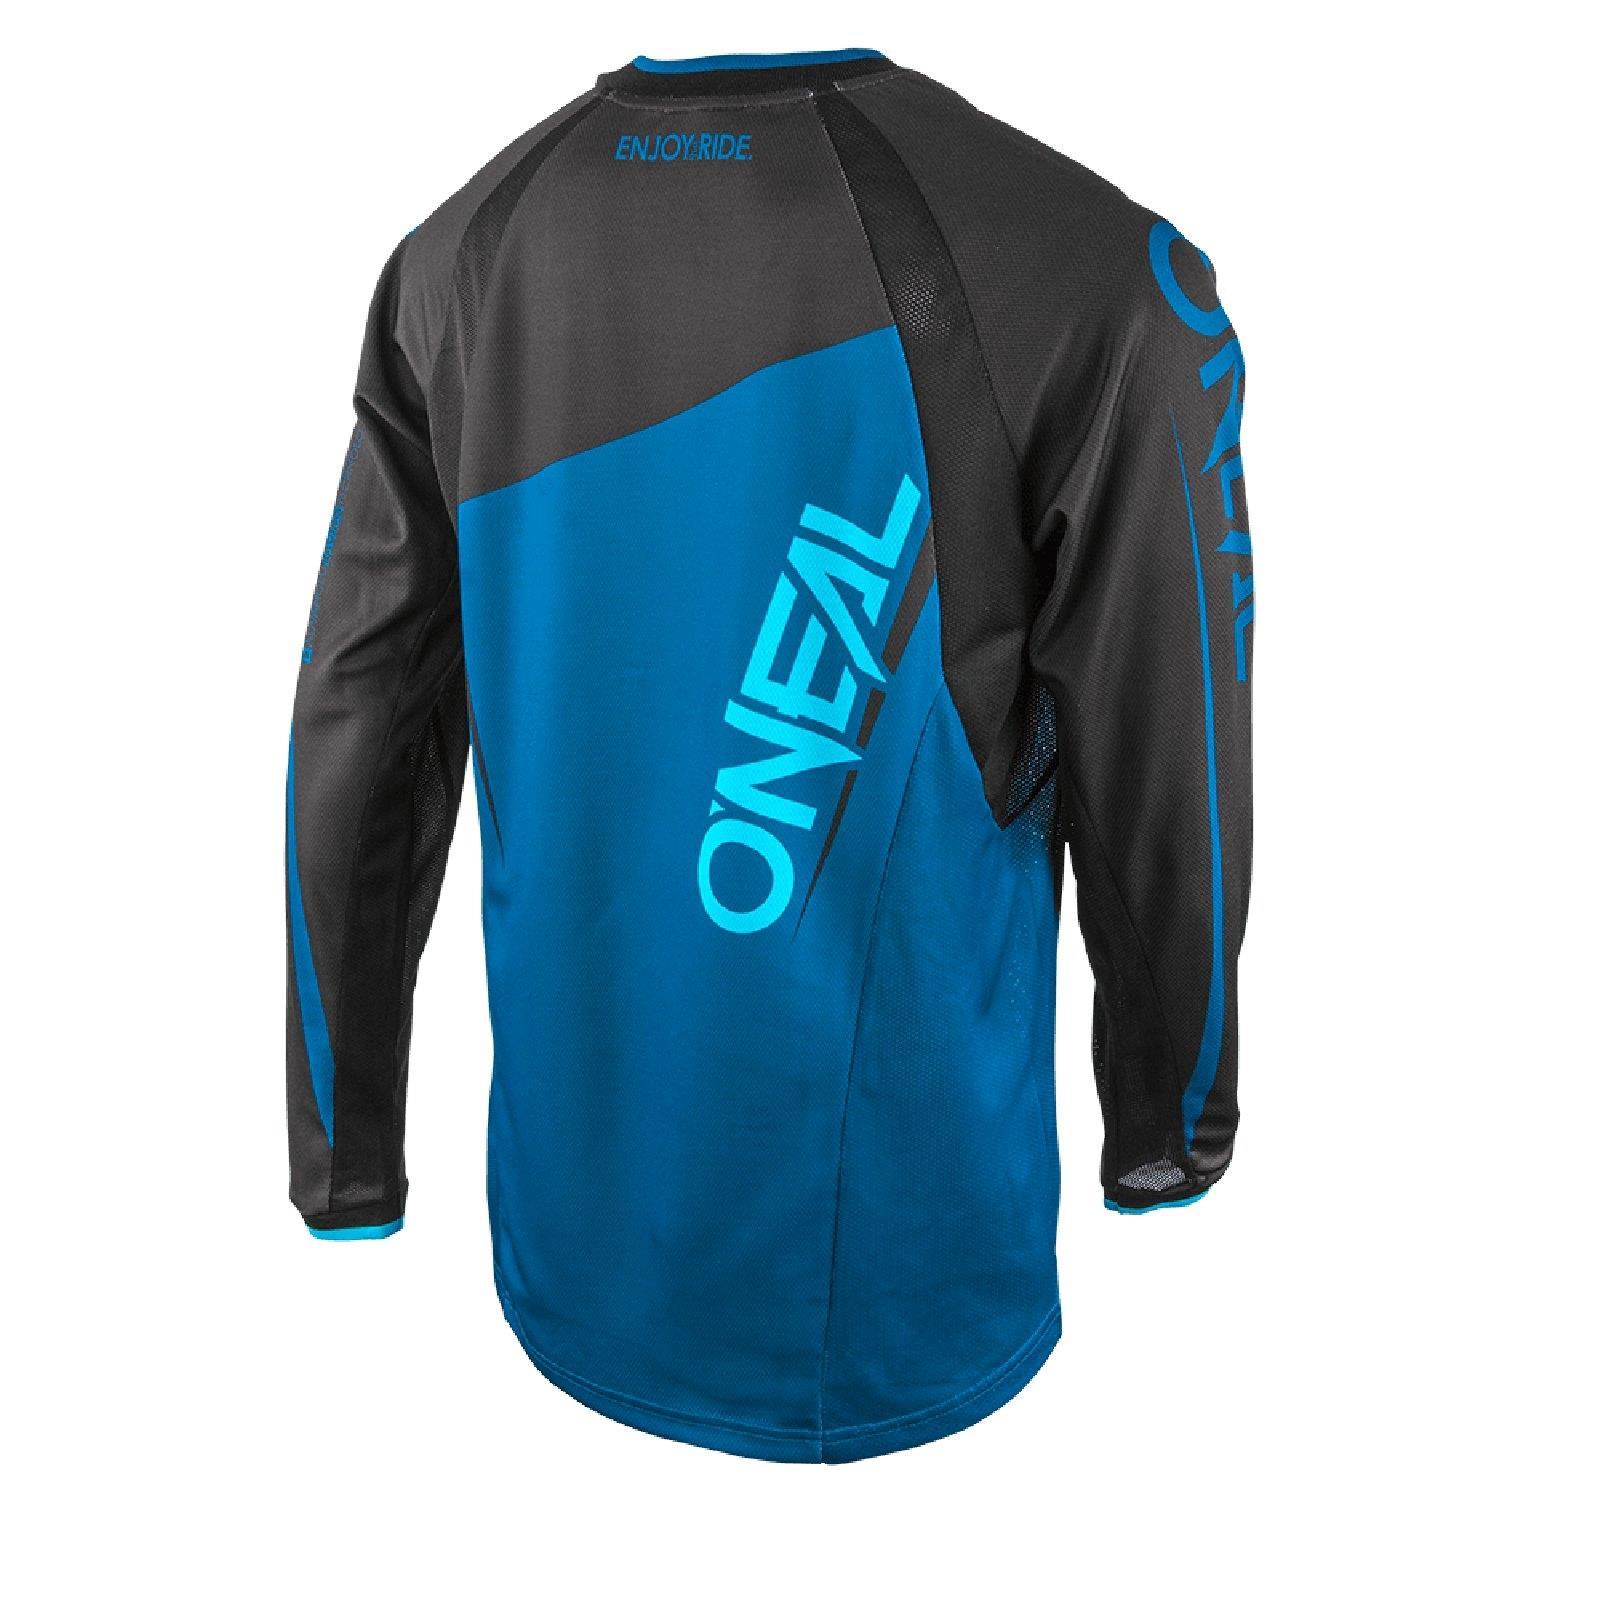 O /'Neal Element Fr jersey a maniche corte MANICA LUNGA MAGLIA PIN IT bicicletta DH bloccanti